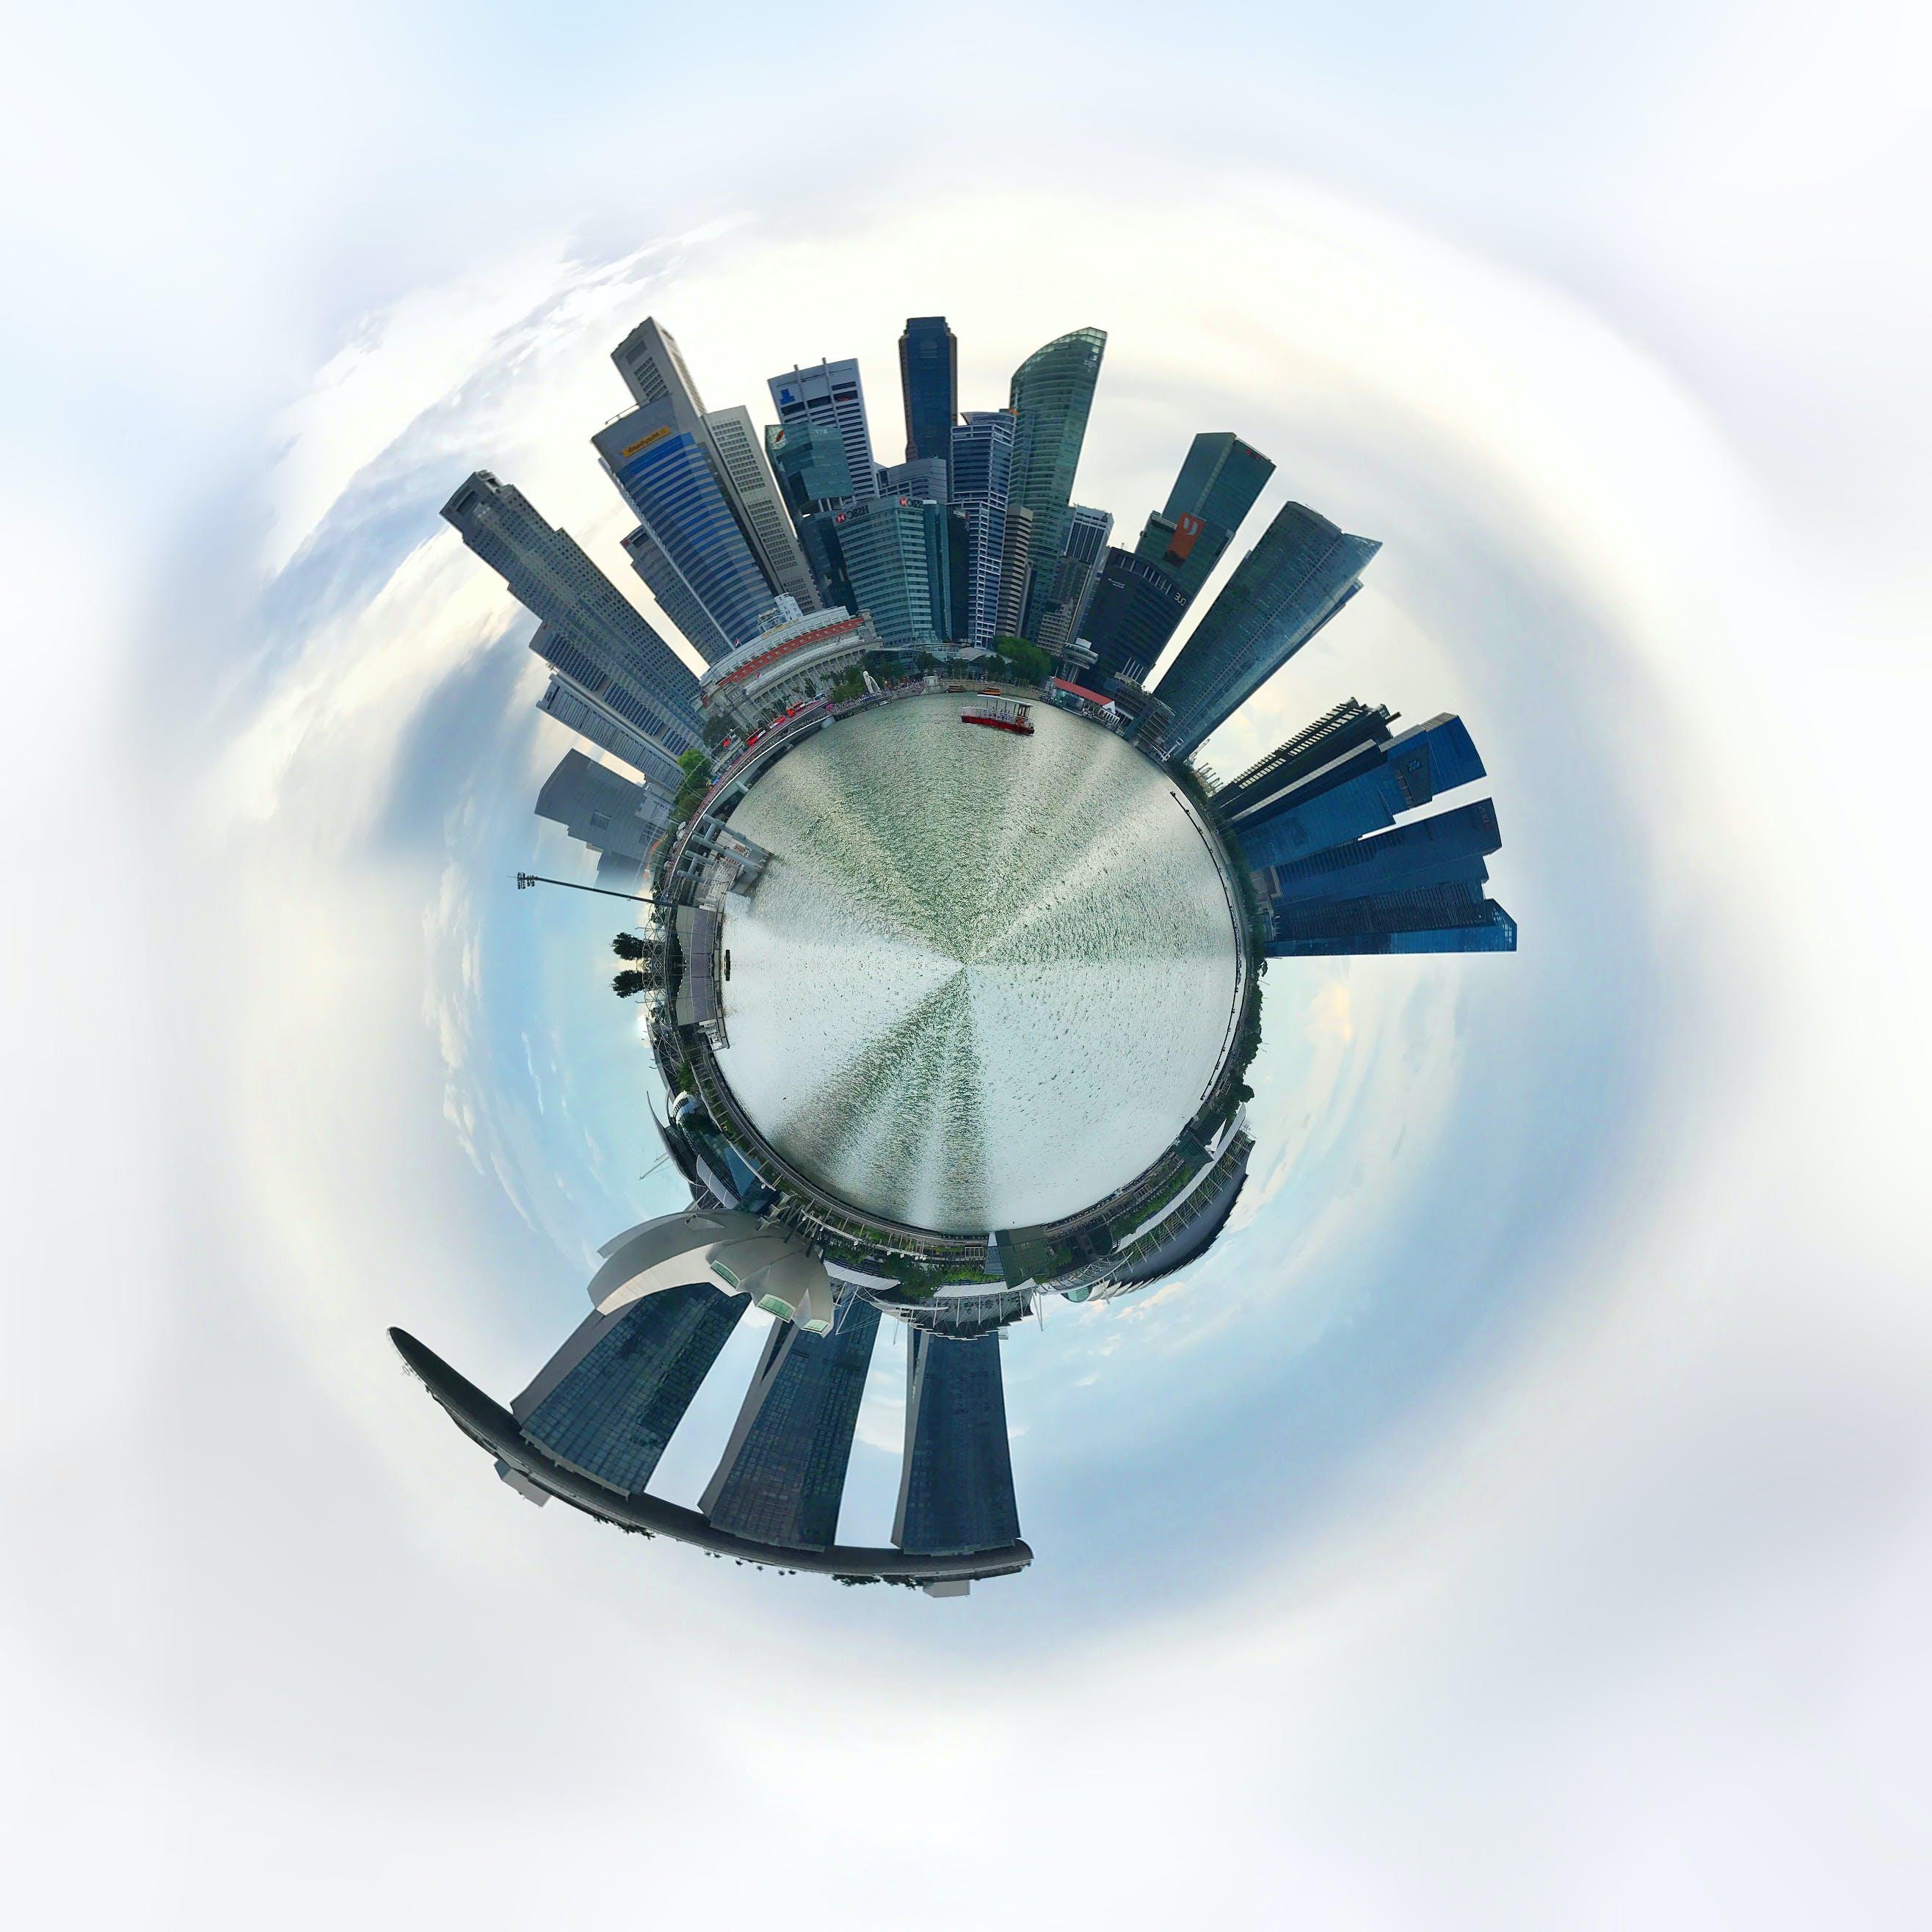 Free stock photo of buildings, singapore, Tiny planet